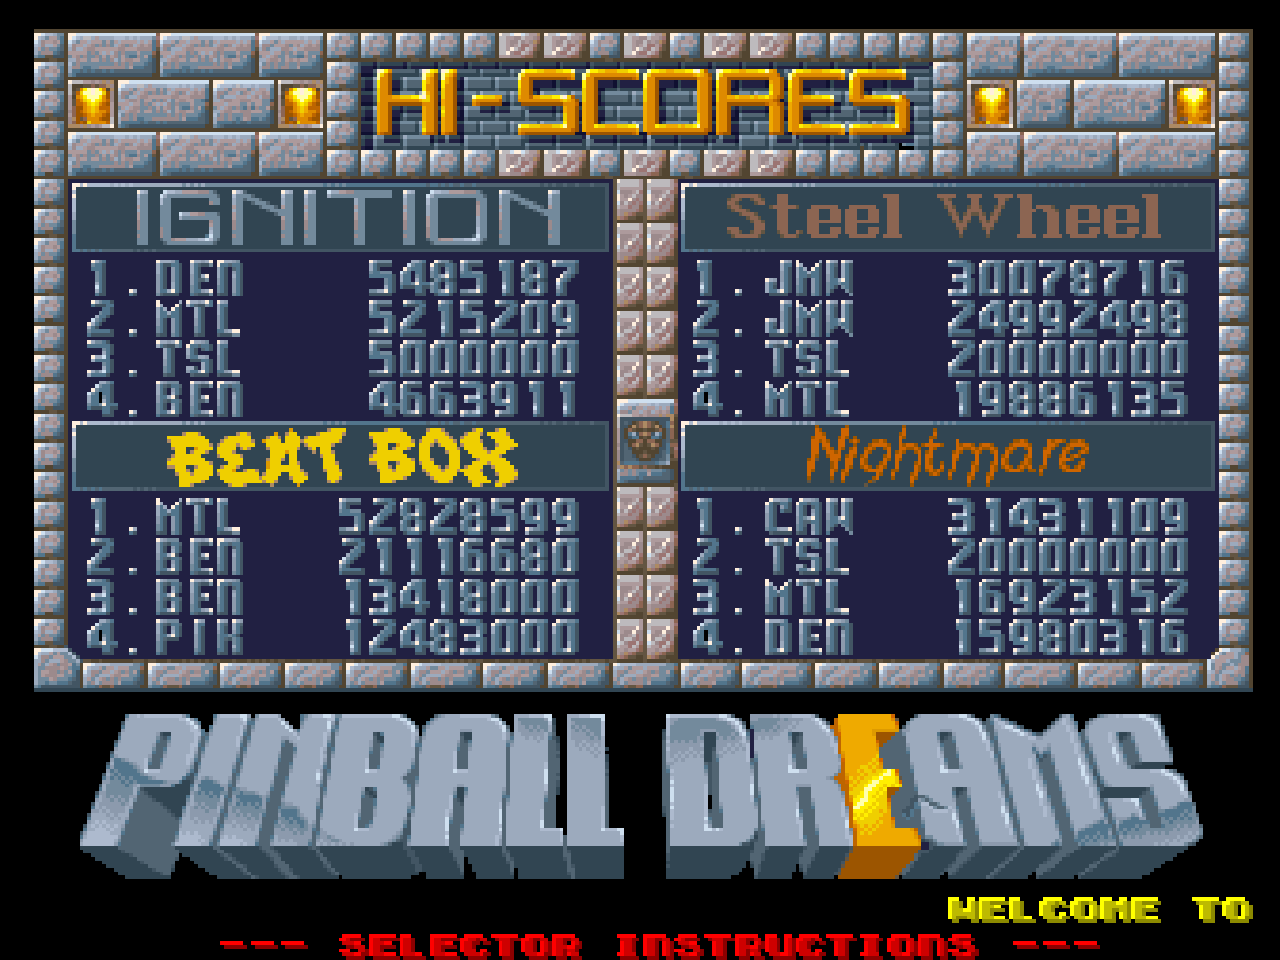 Mantalow: Pinball Dreams: Nightmare (Amiga Emulated) 16,923,152 points on 2015-05-12 06:50:55